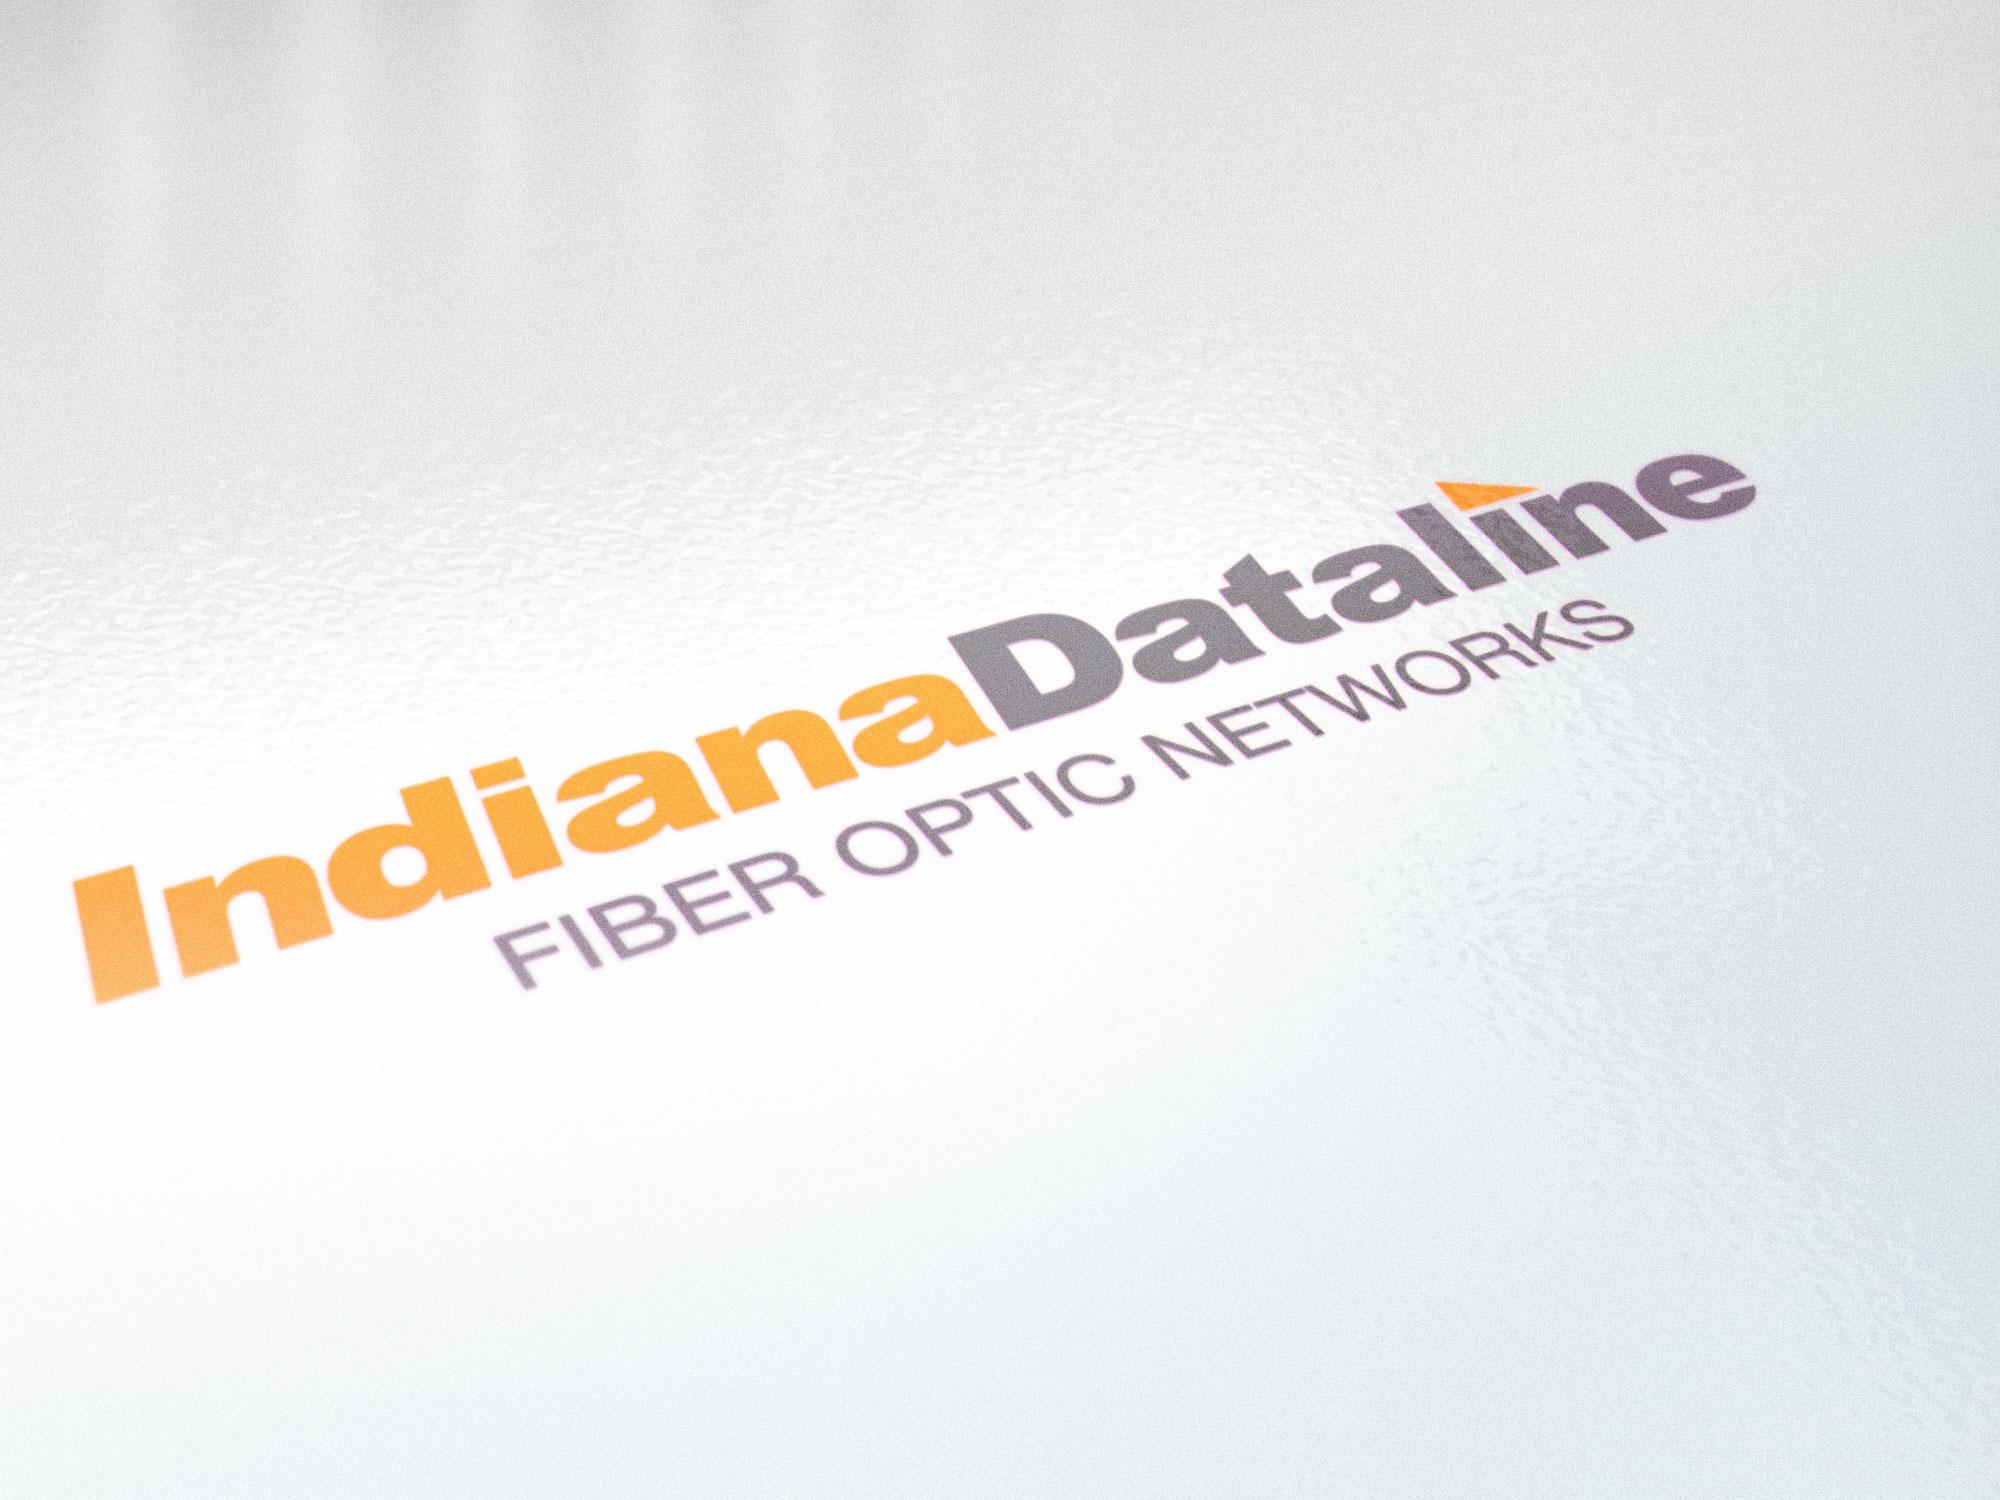 indiana-dataline